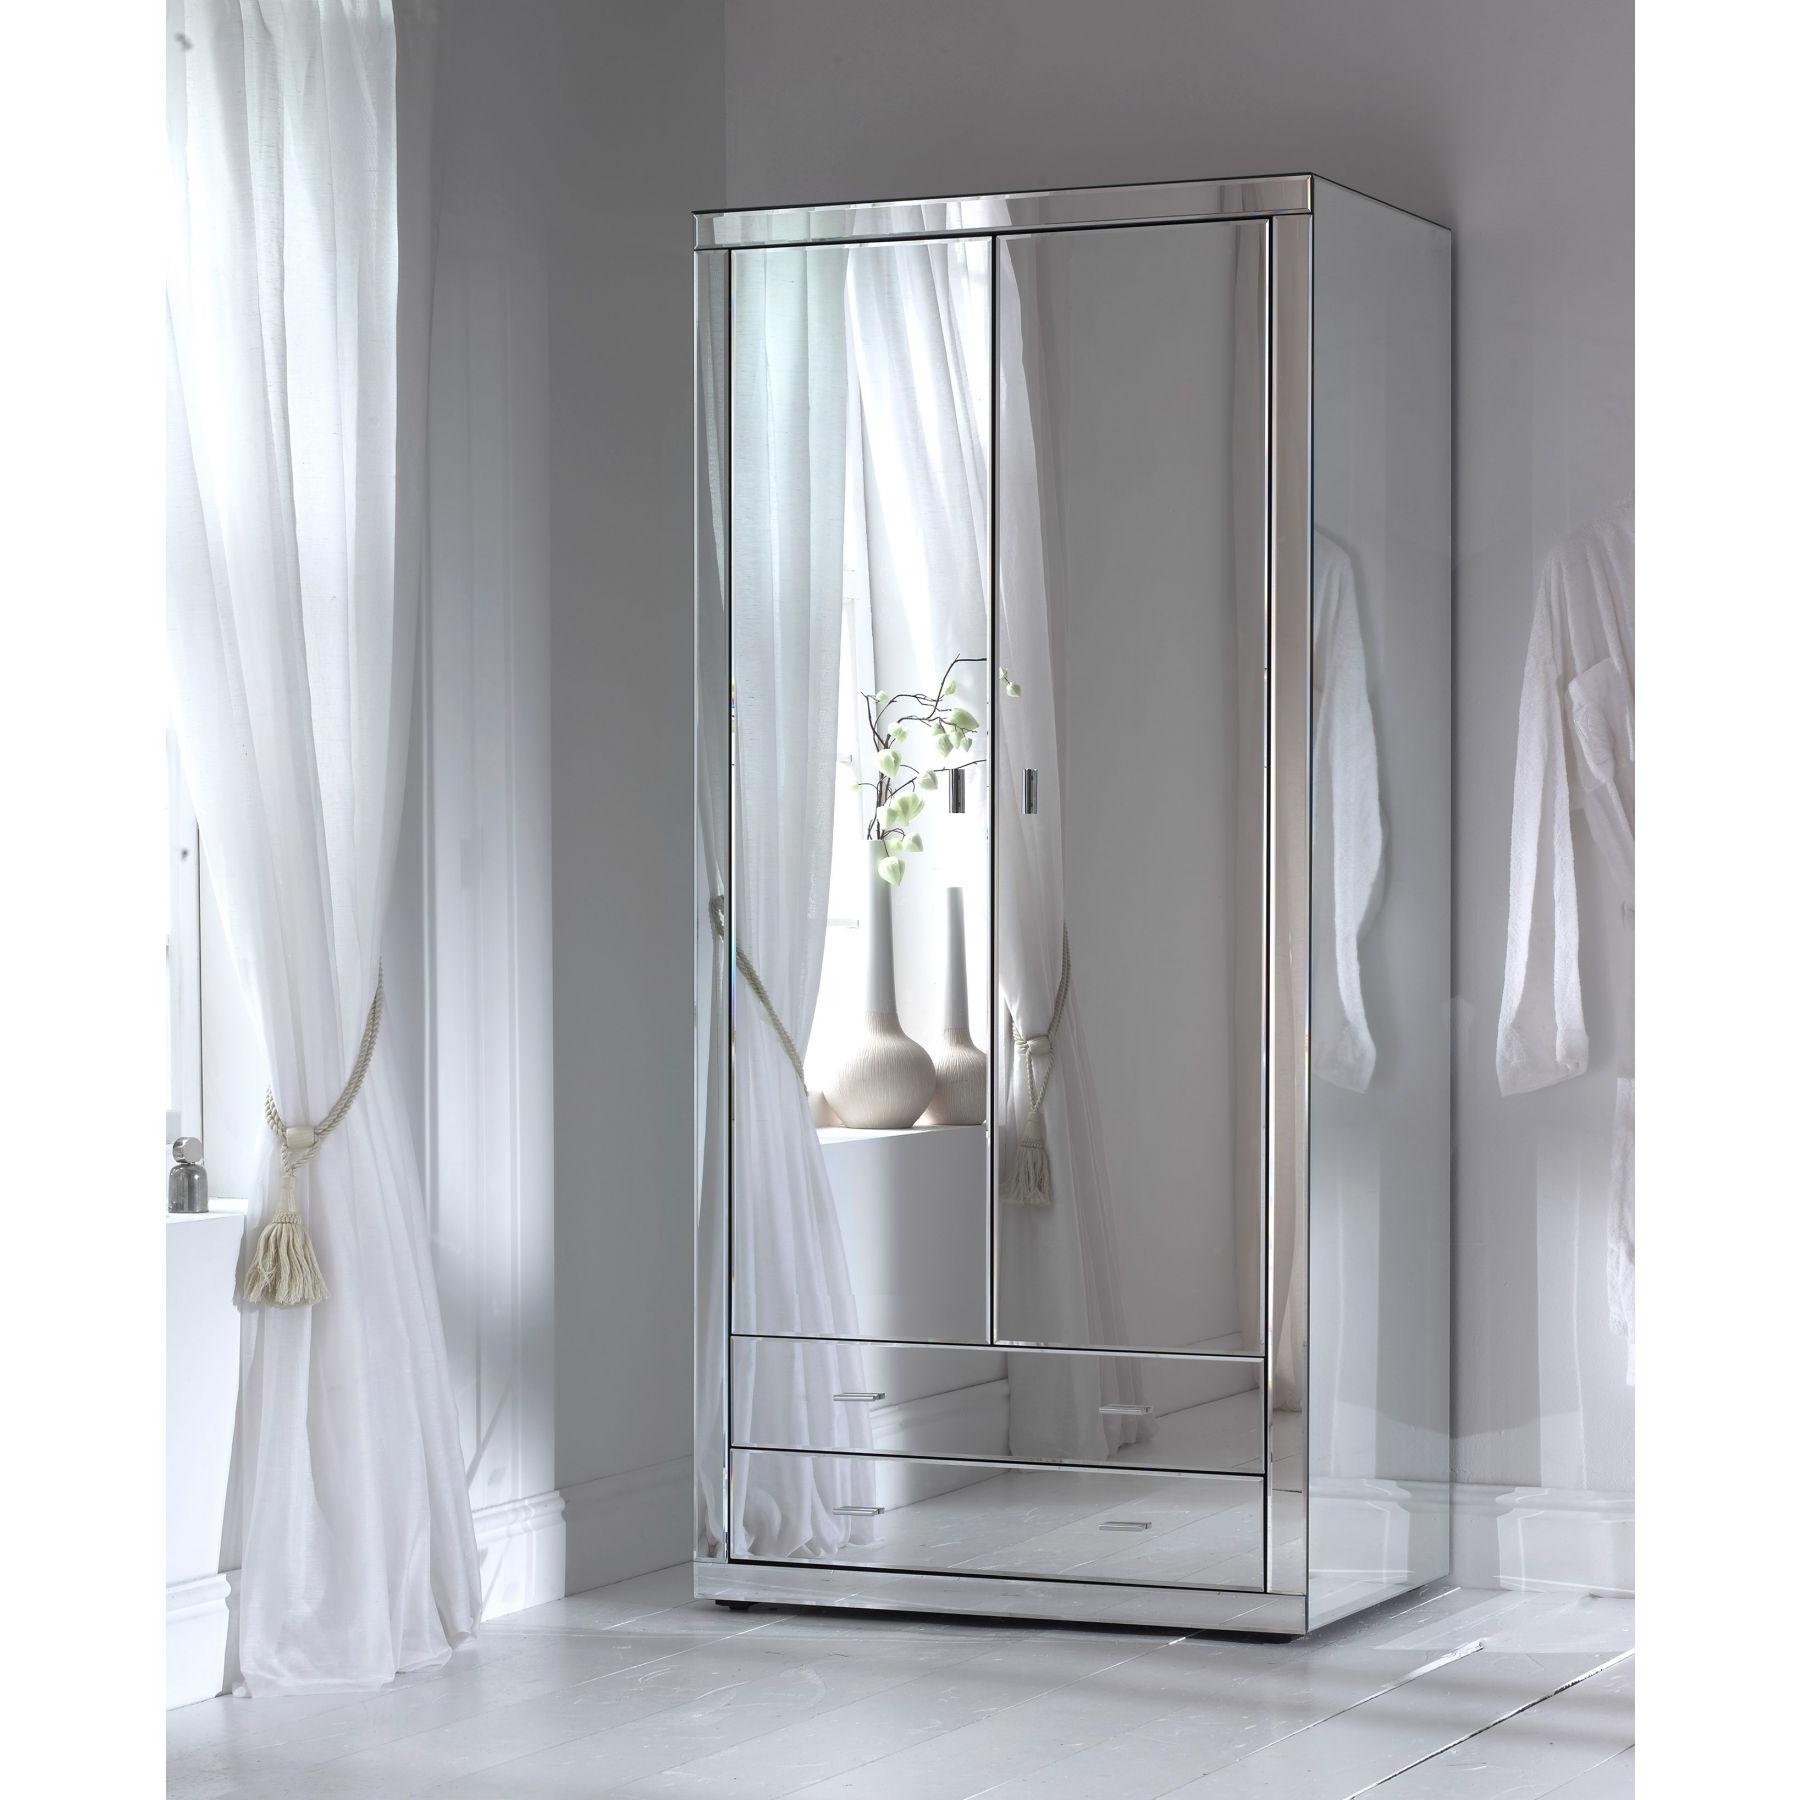 Recent All Mirror Wardrobe – Blog Regarding Full Mirrored Wardrobes (View 12 of 15)